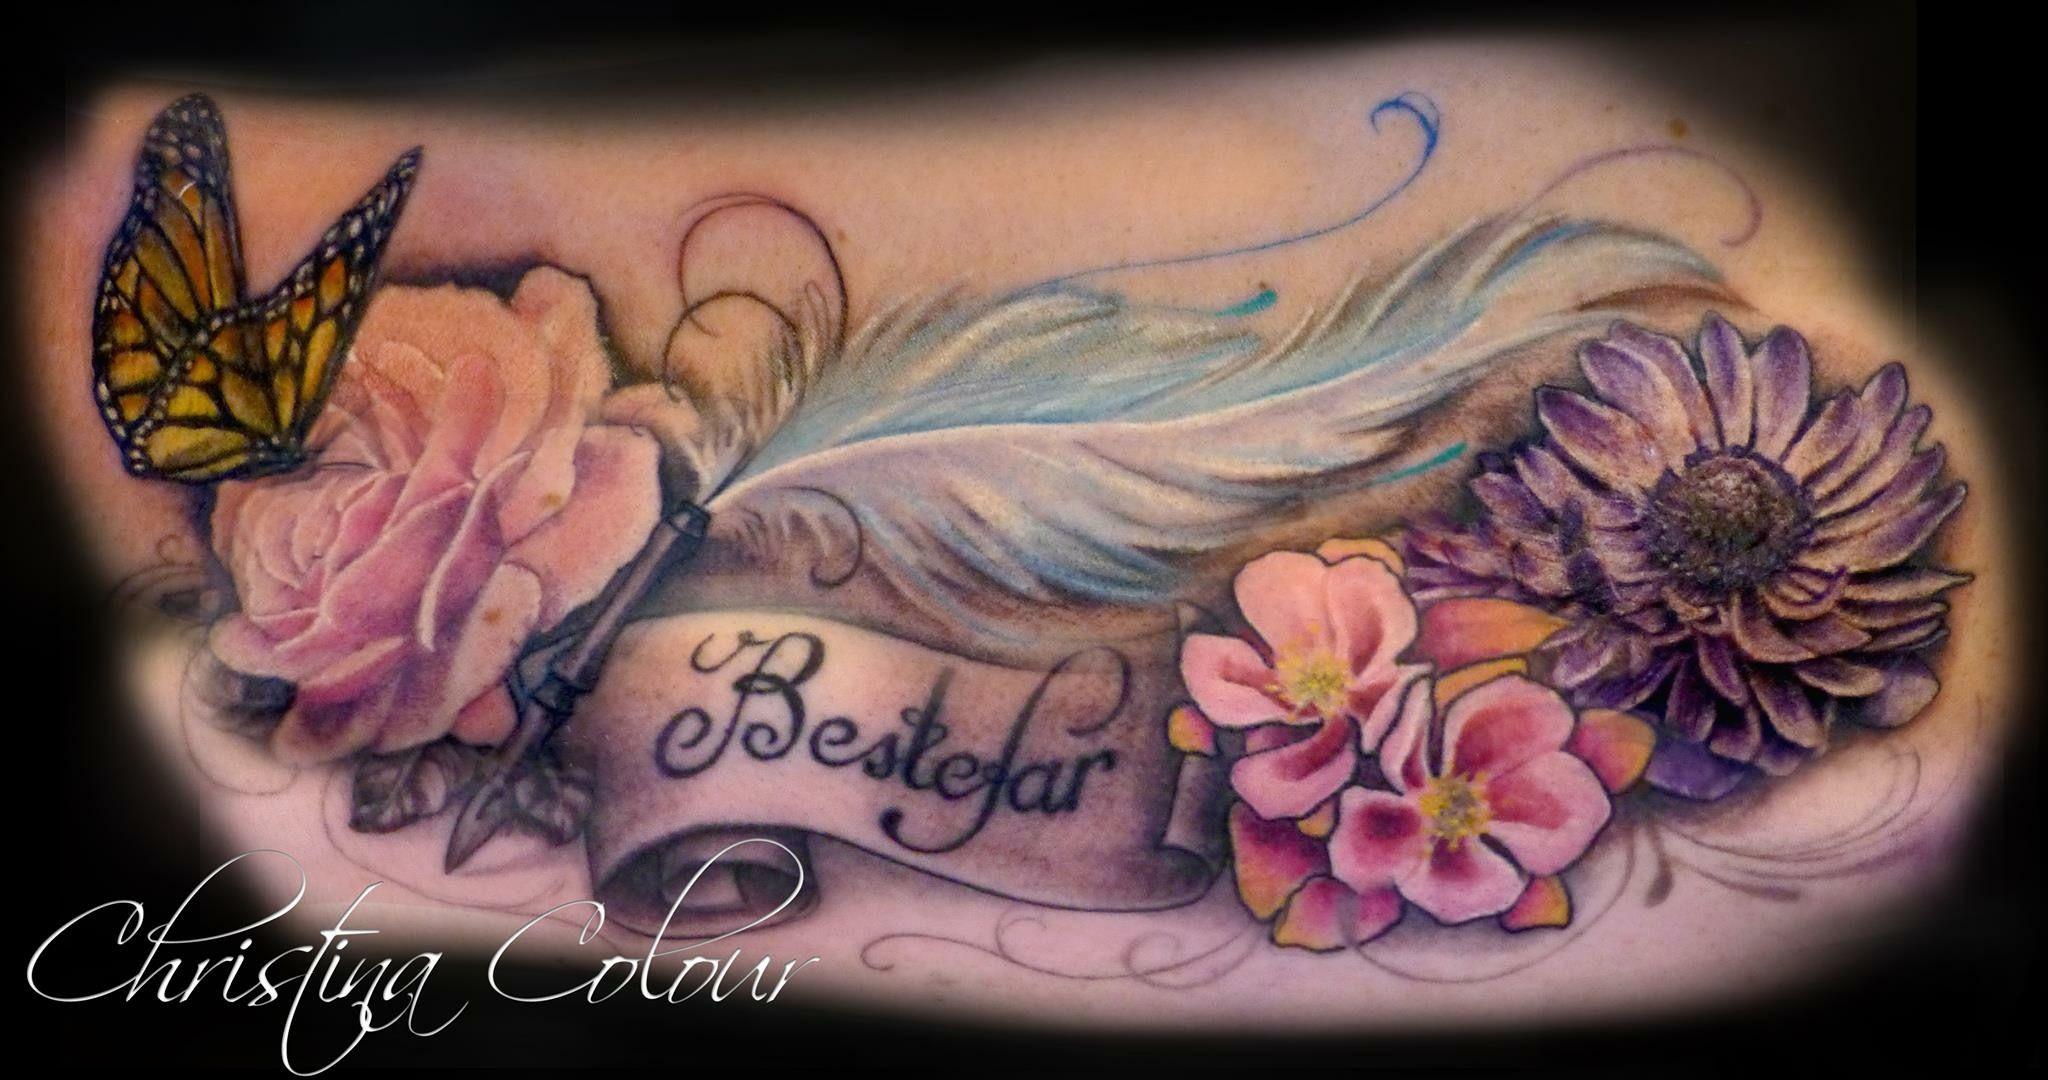 Pin by Kay Diaz on Tattoos Tattoos, Watercolor tattoo